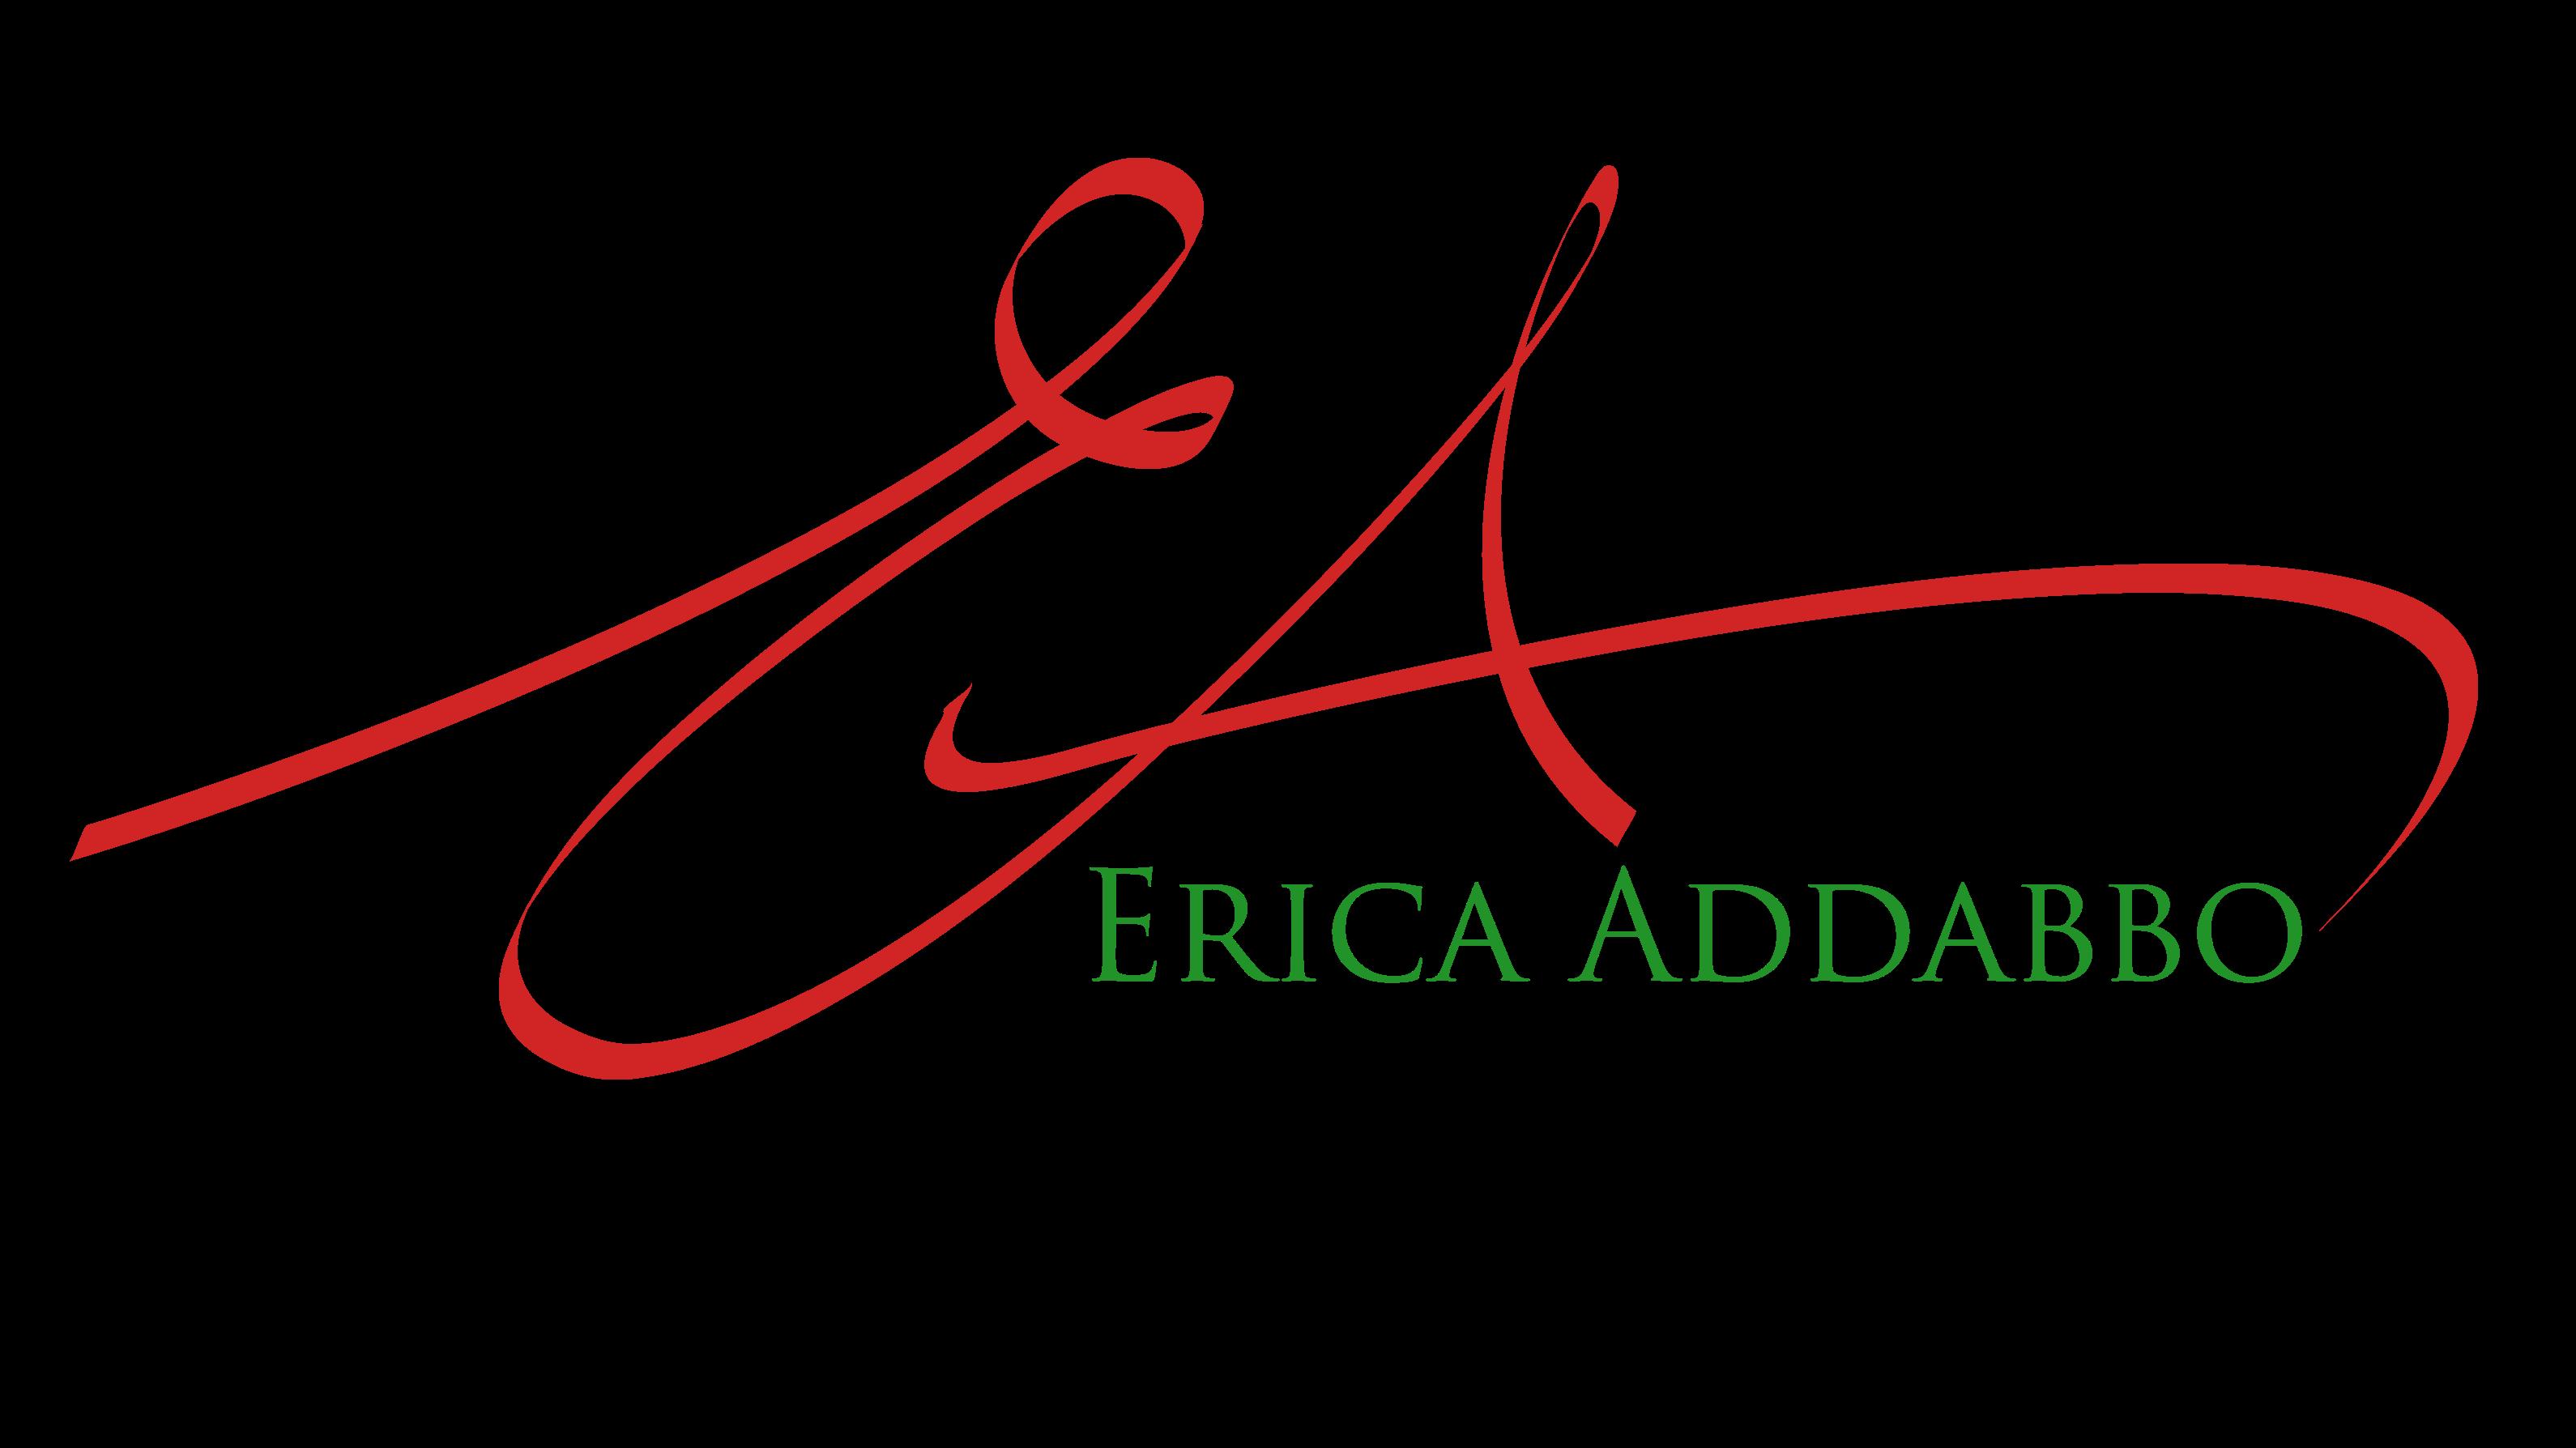 Erica Addabbo